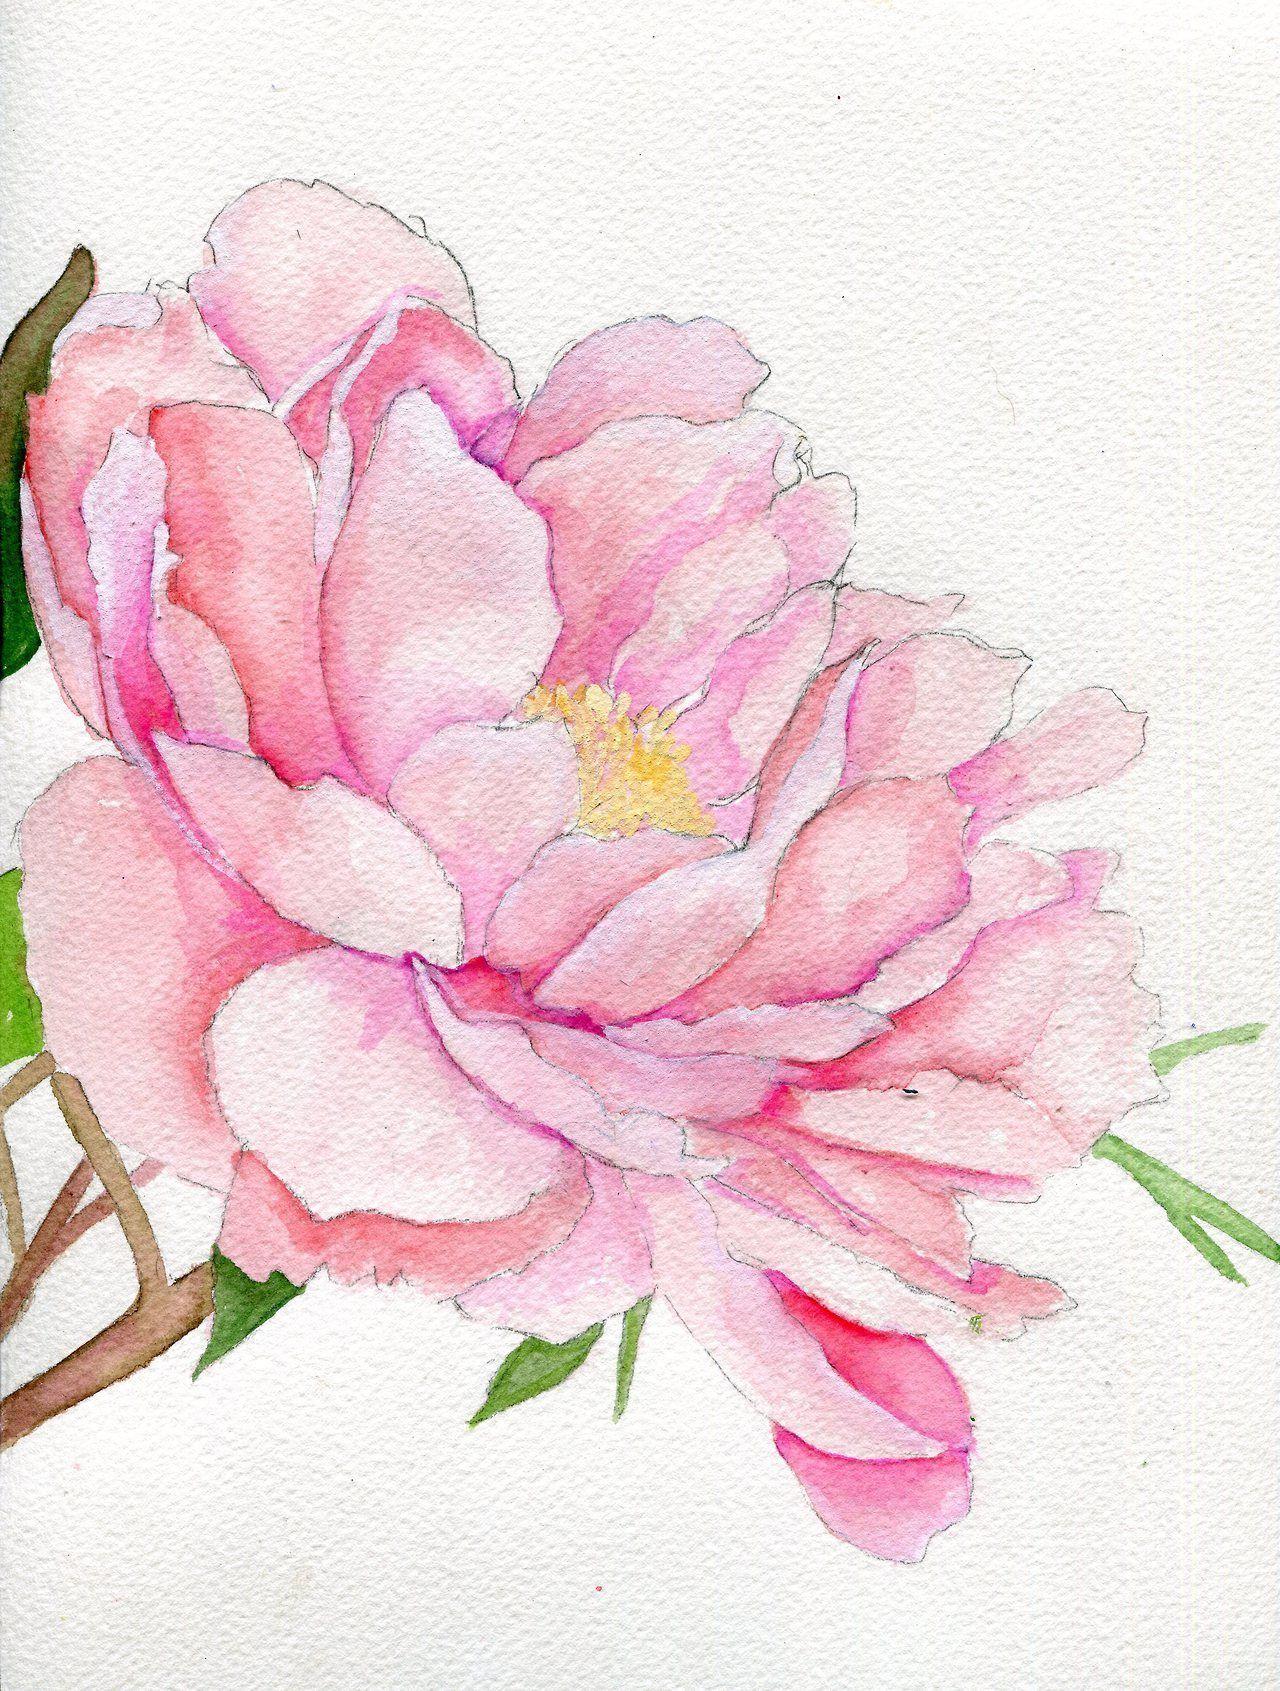 Pretty Flowers Tumblr Watercolor Peonies Floral Watercolor